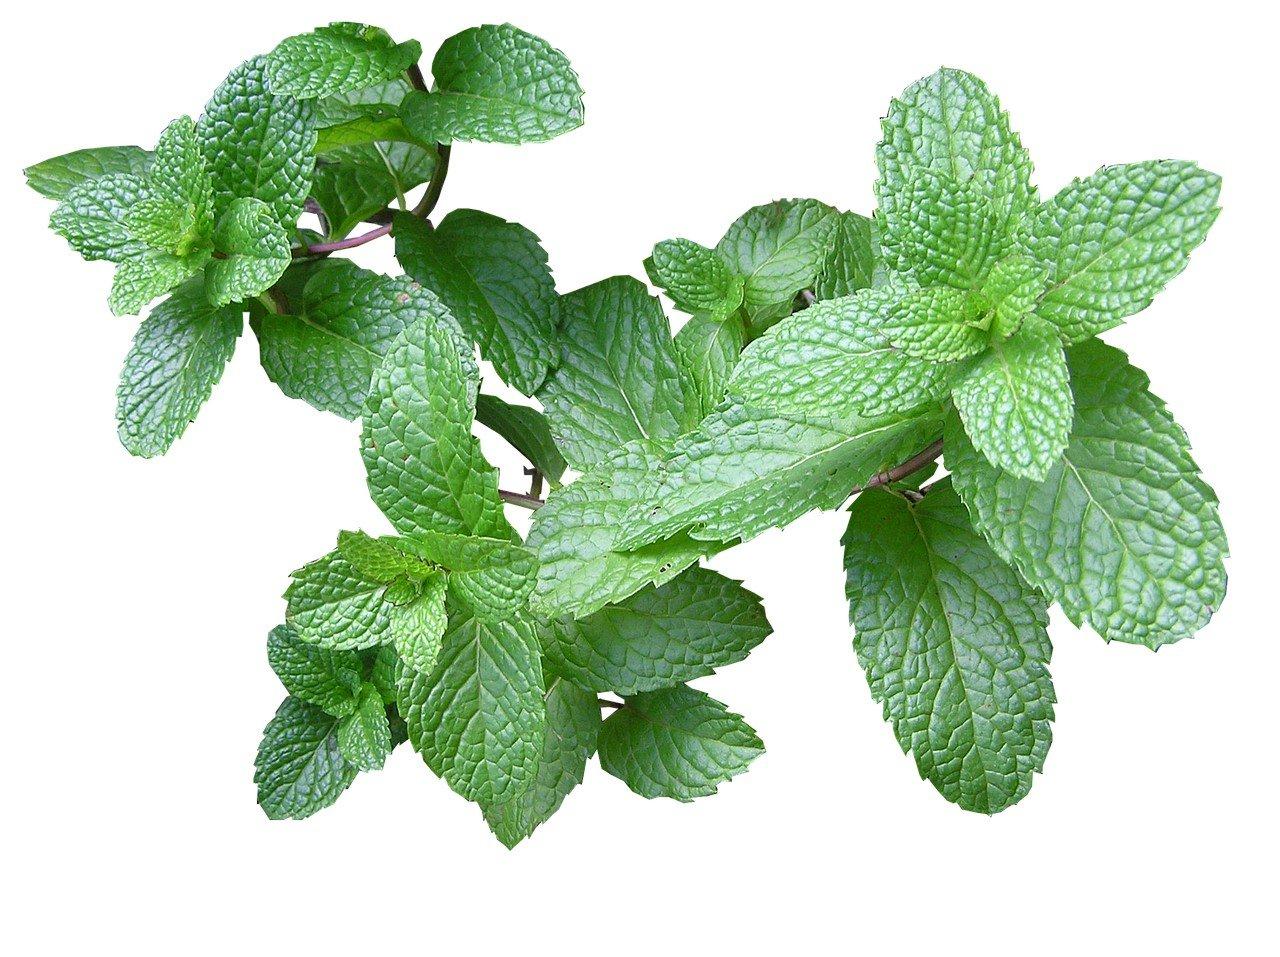 herb-2540568_1280